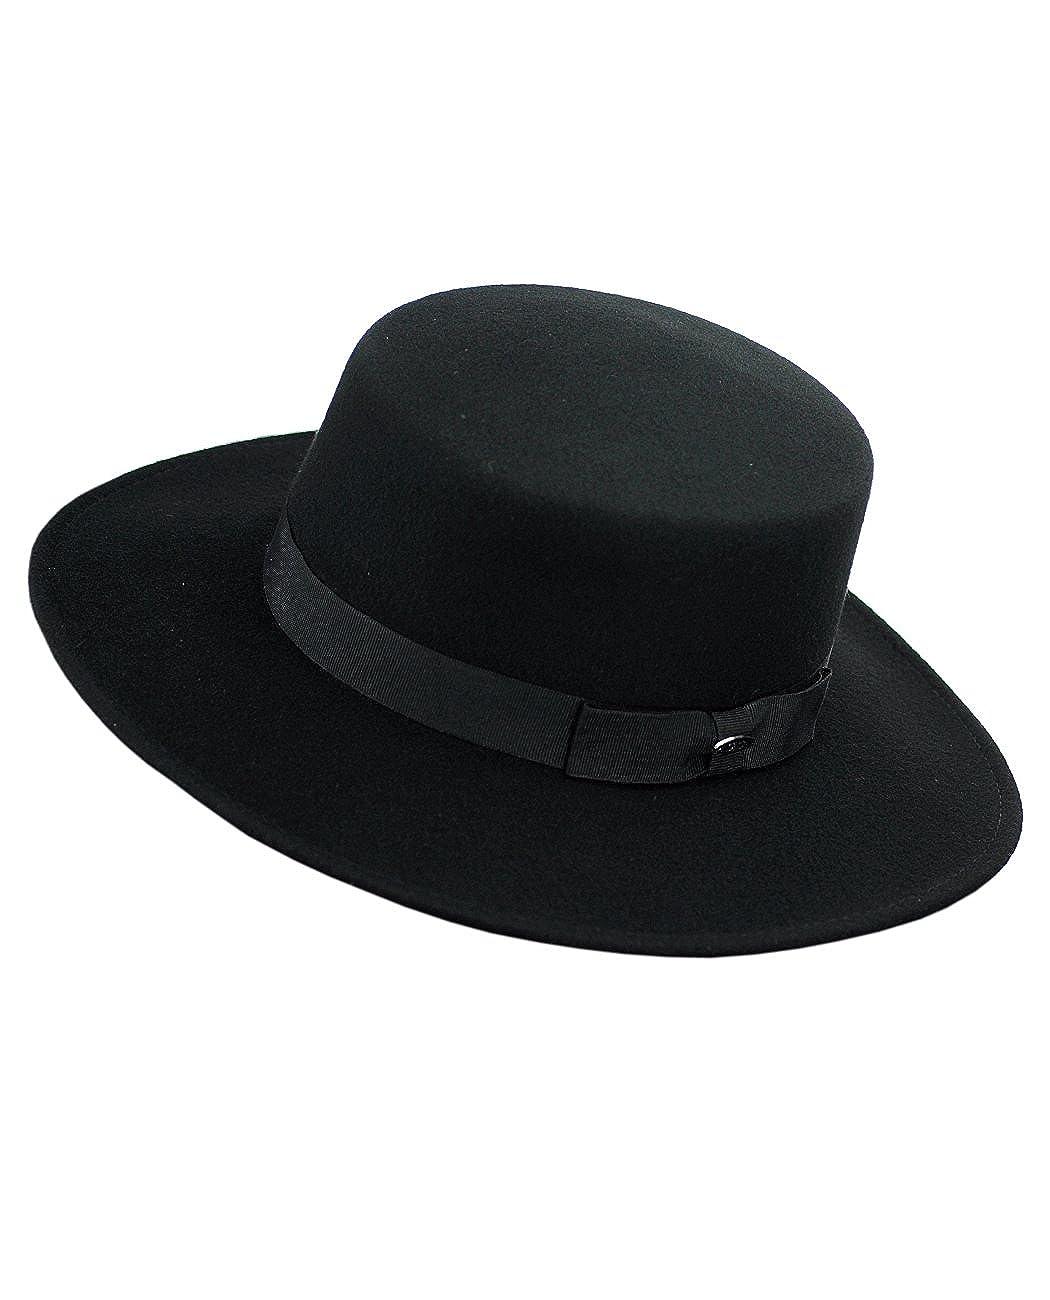 Ladies Tea Party Hats- Victorian to 1950s styles  Wool Wide Brim Porkpie Fedora Hat w/Simple Band Accent NYFASHION101 $39.99 AT vintagedancer.com